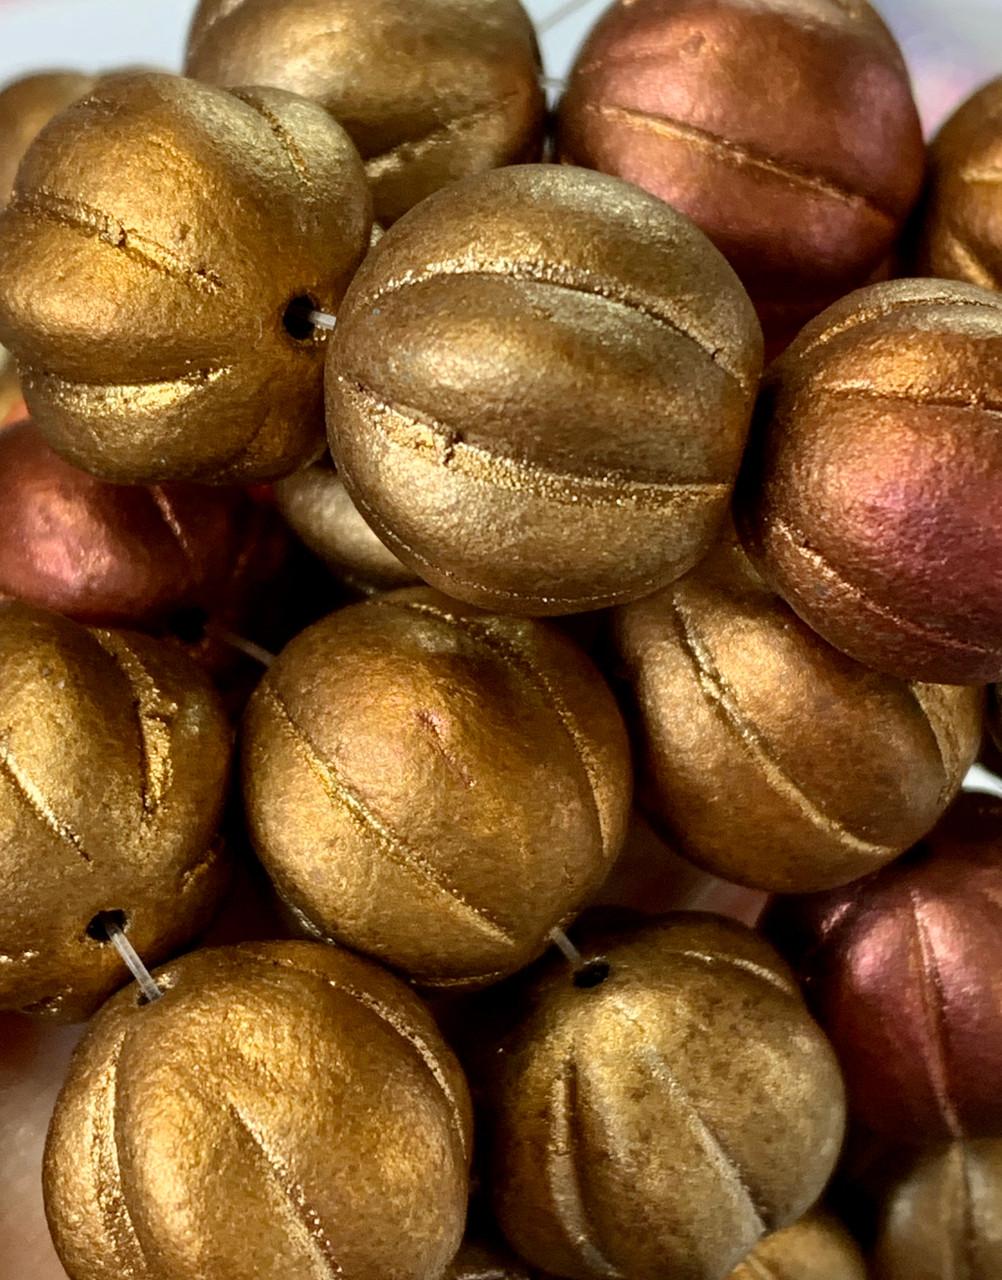 14mm Metallic Mix Melon Beads - SOLD PER BEAD